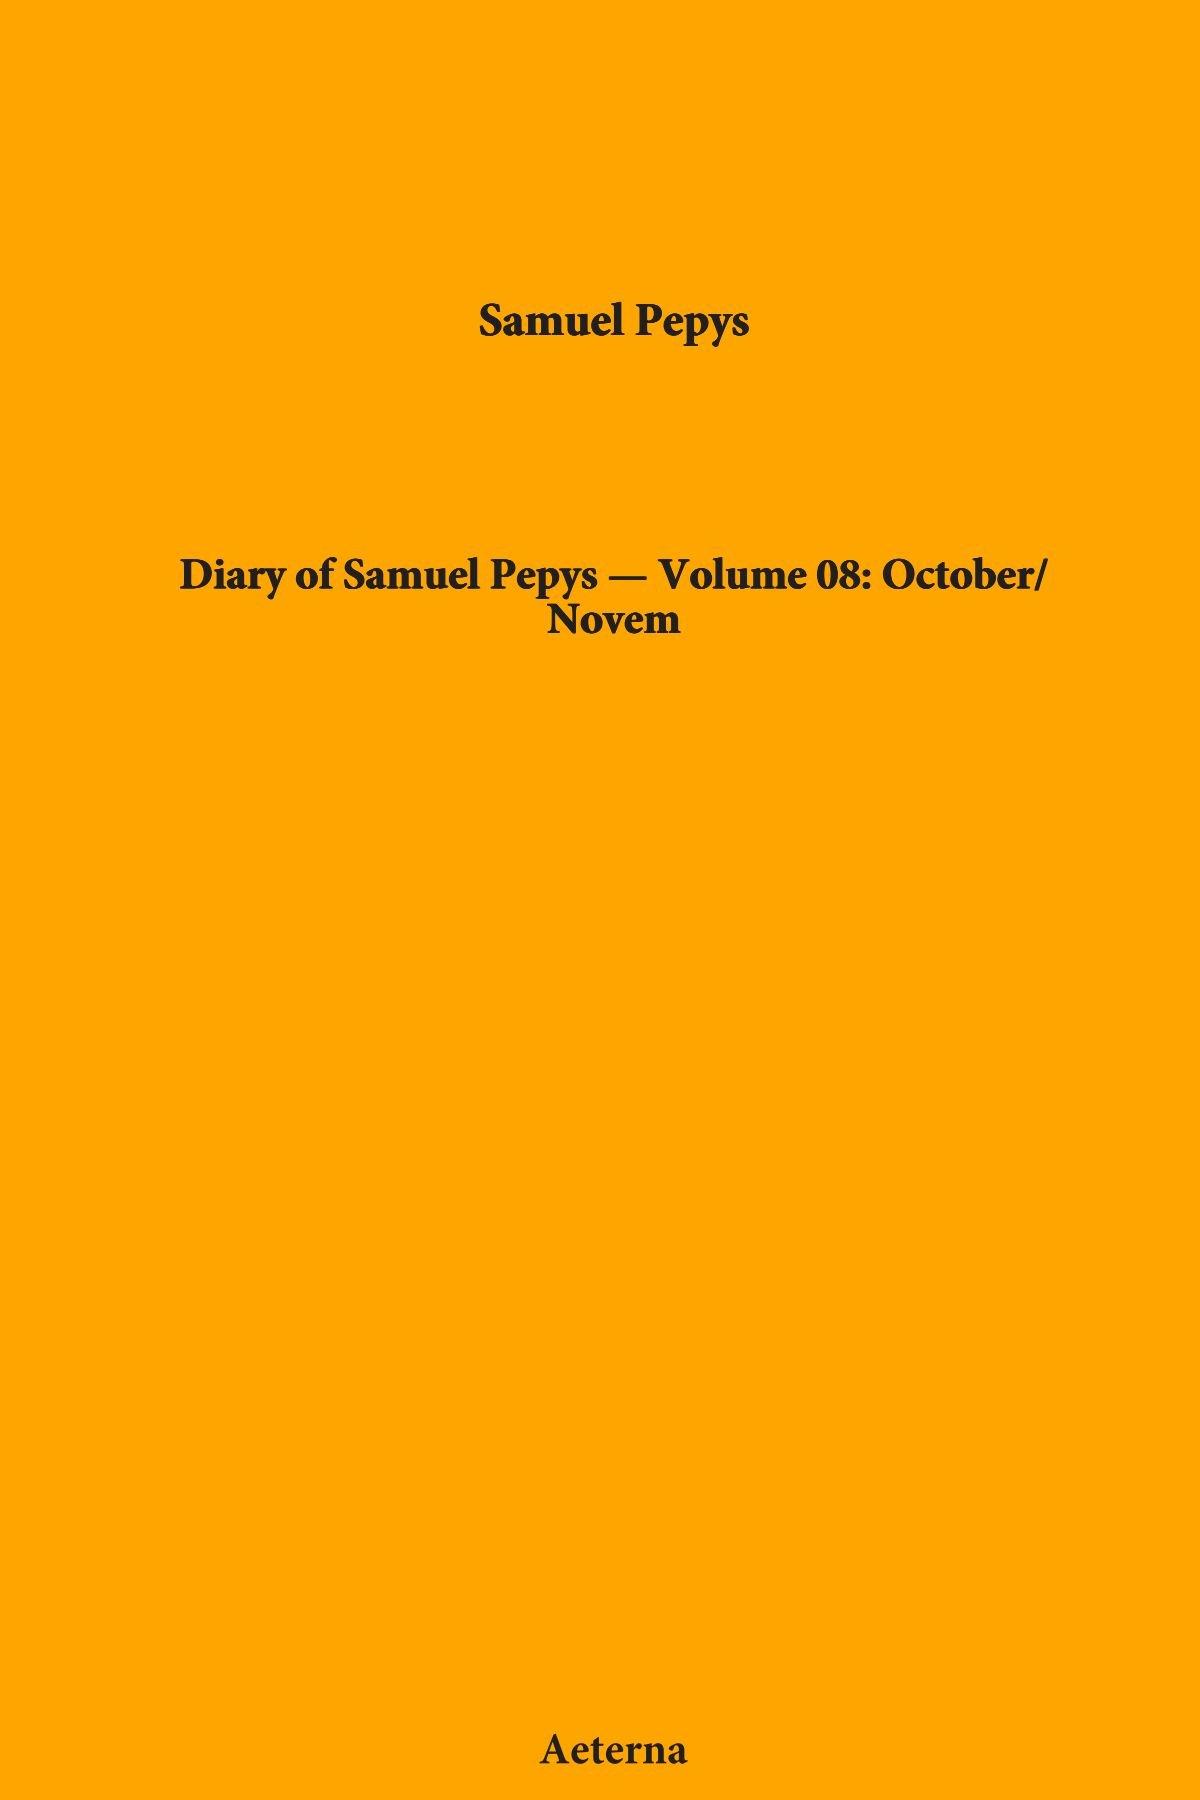 Download Diary of Samuel Pepys — Volume 08: October/Novem ebook